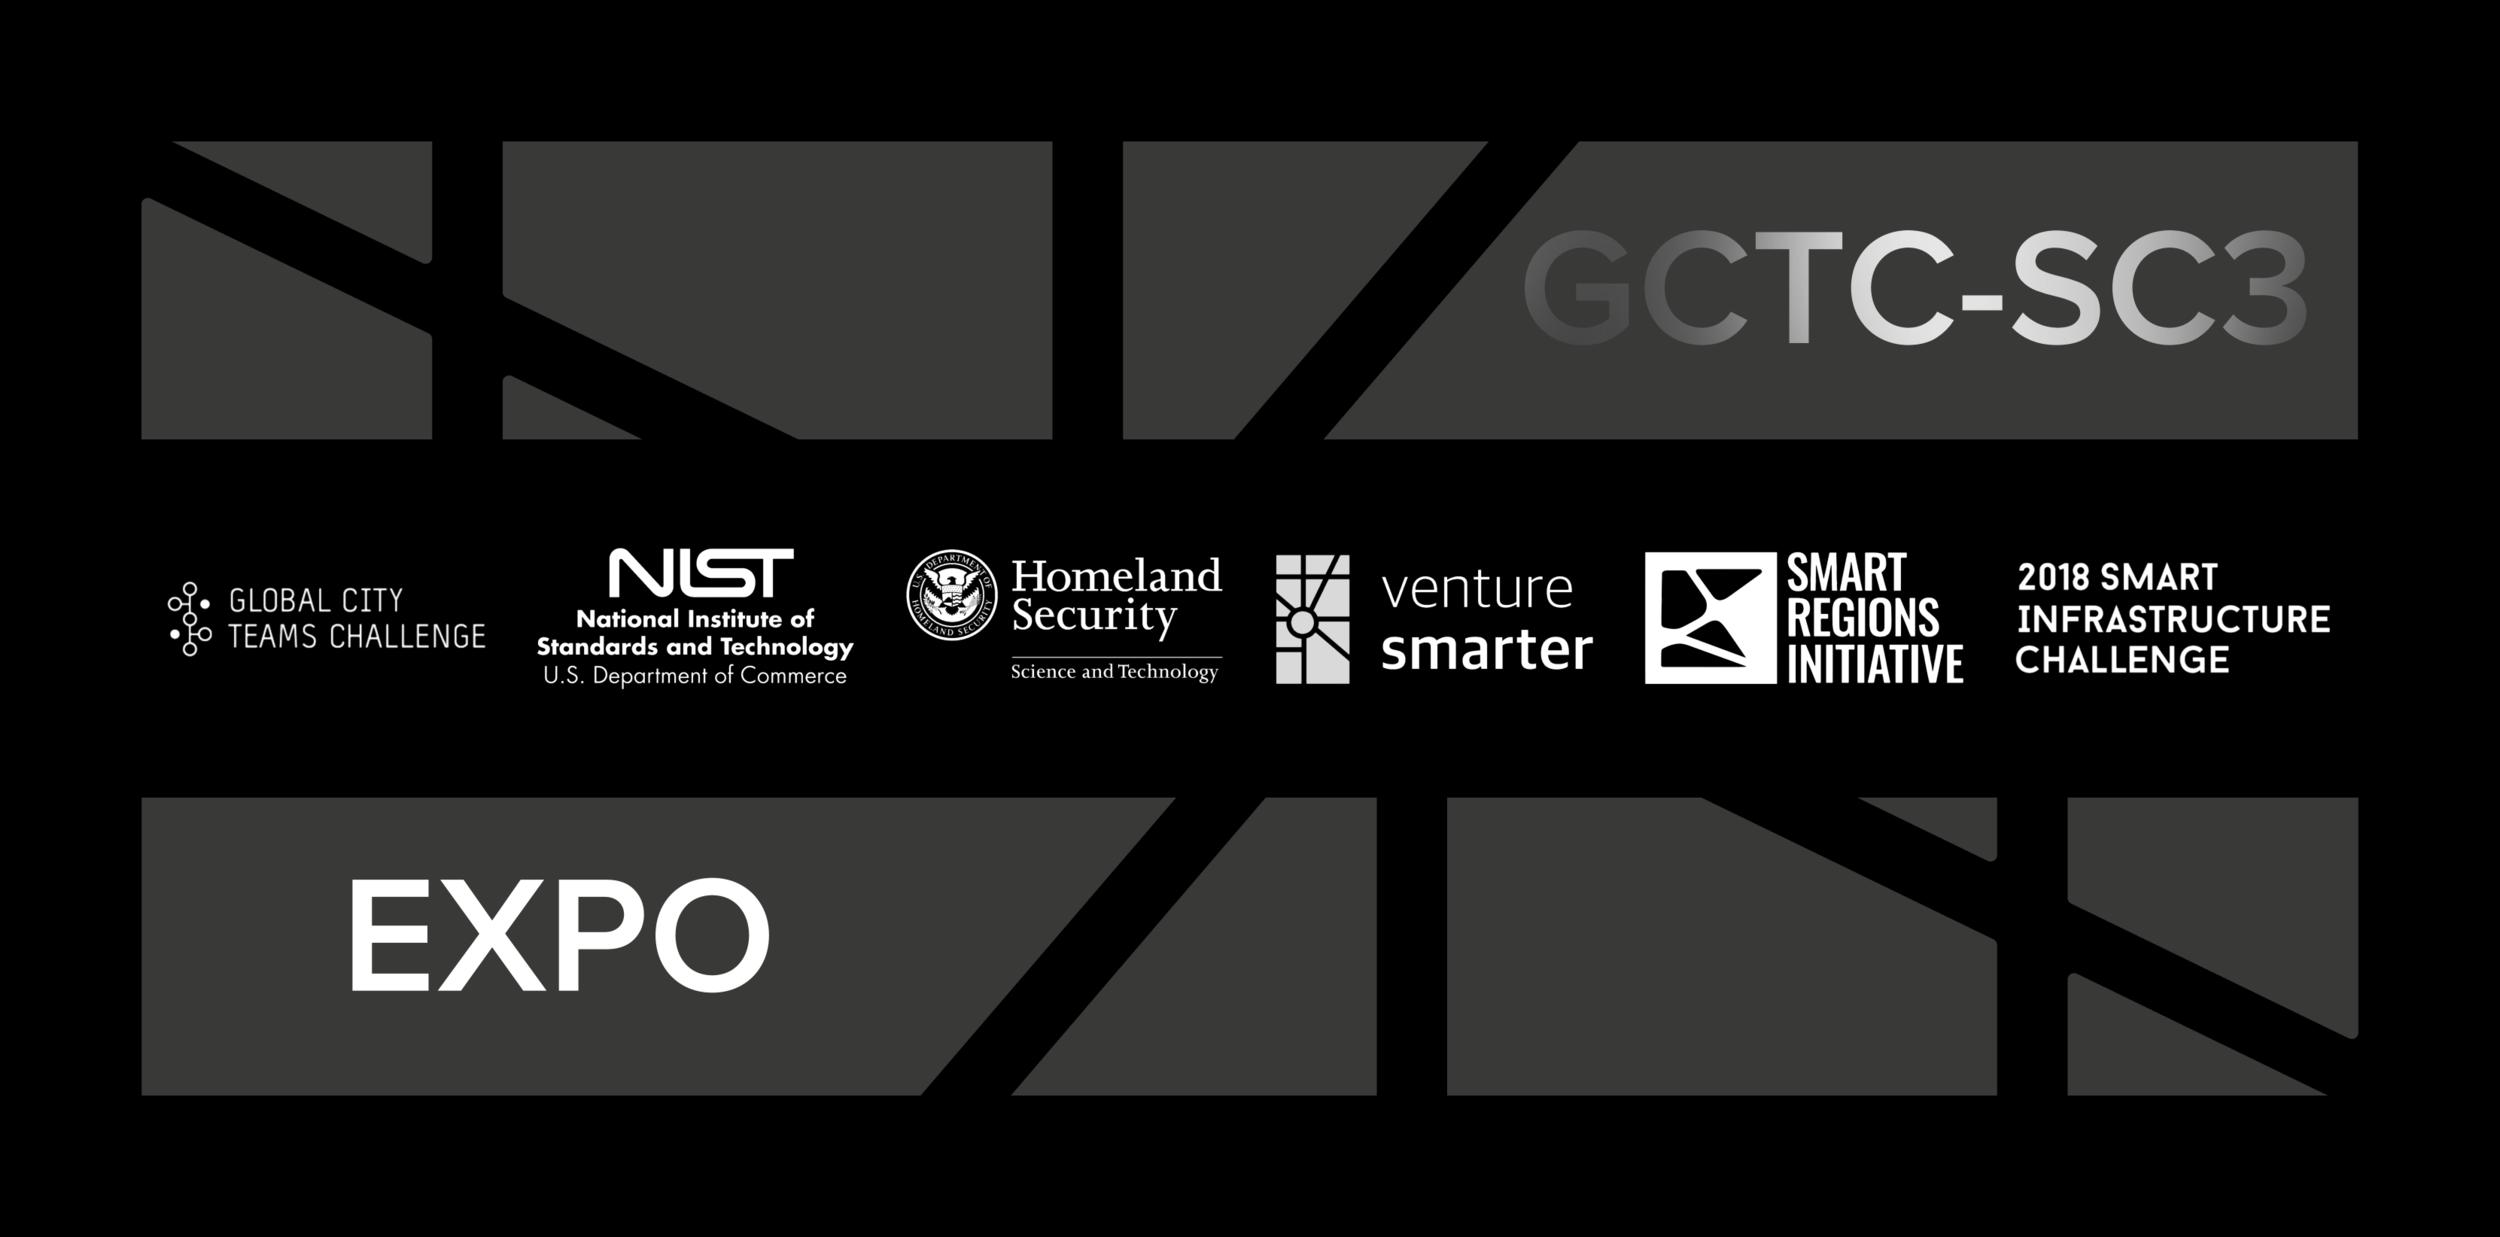 Venture Smarter at the 2019 GCTC-SC3 Expo